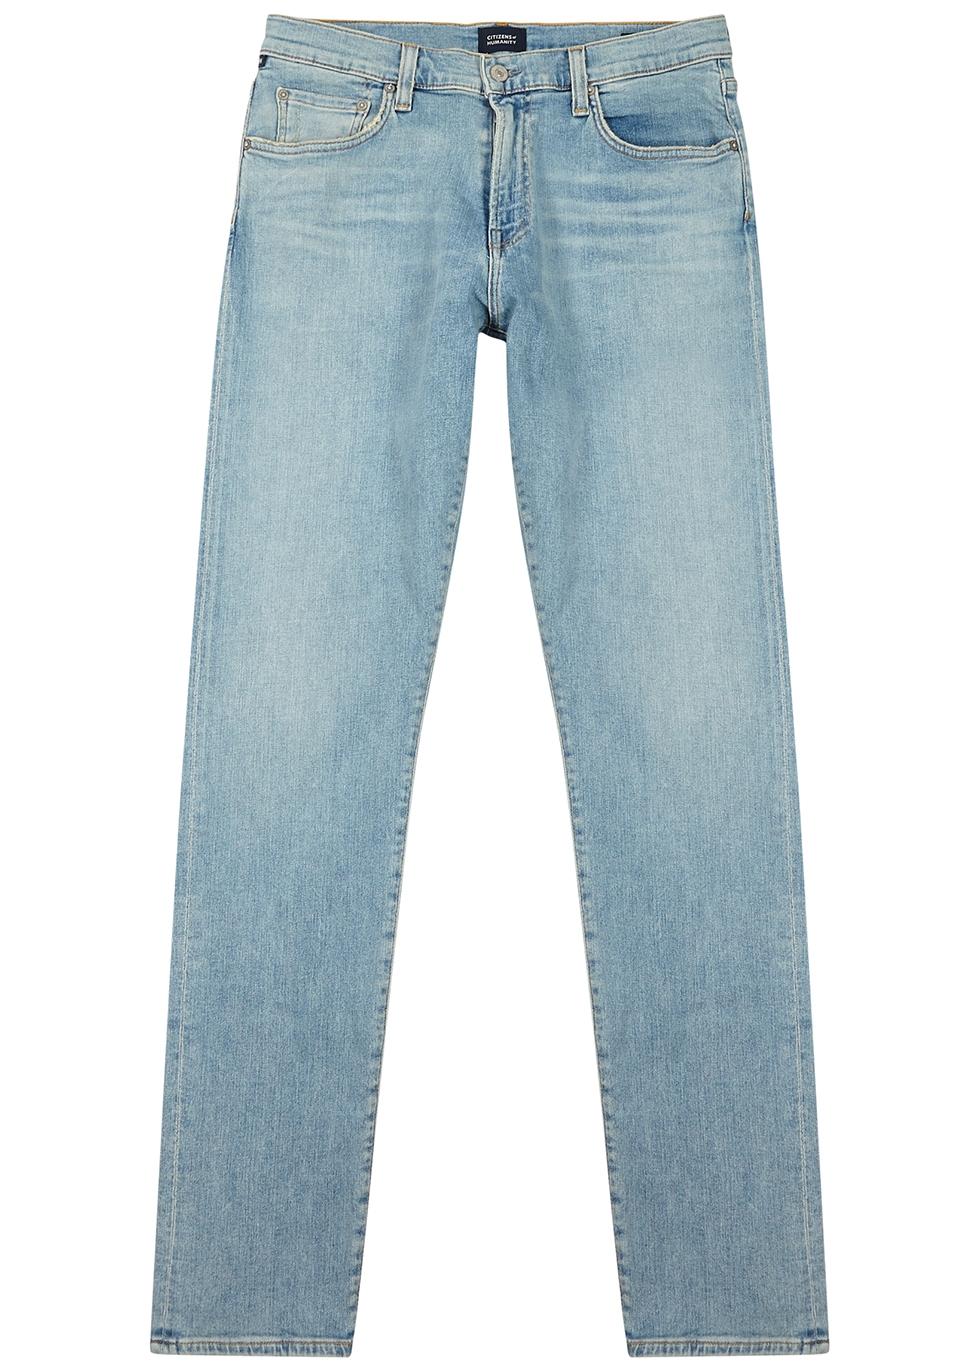 London light blue slim-leg jeans